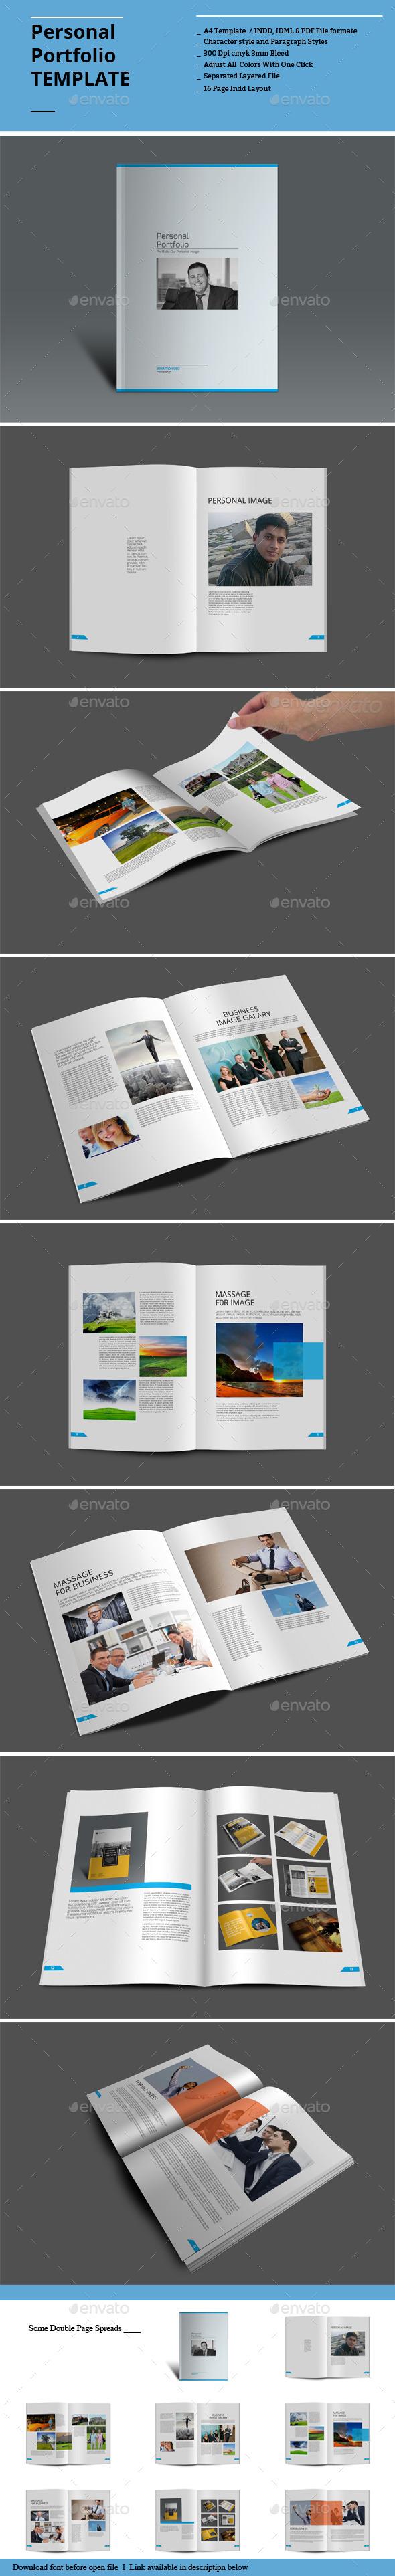 GraphicRiver Personal Portfolio Templates 8954153